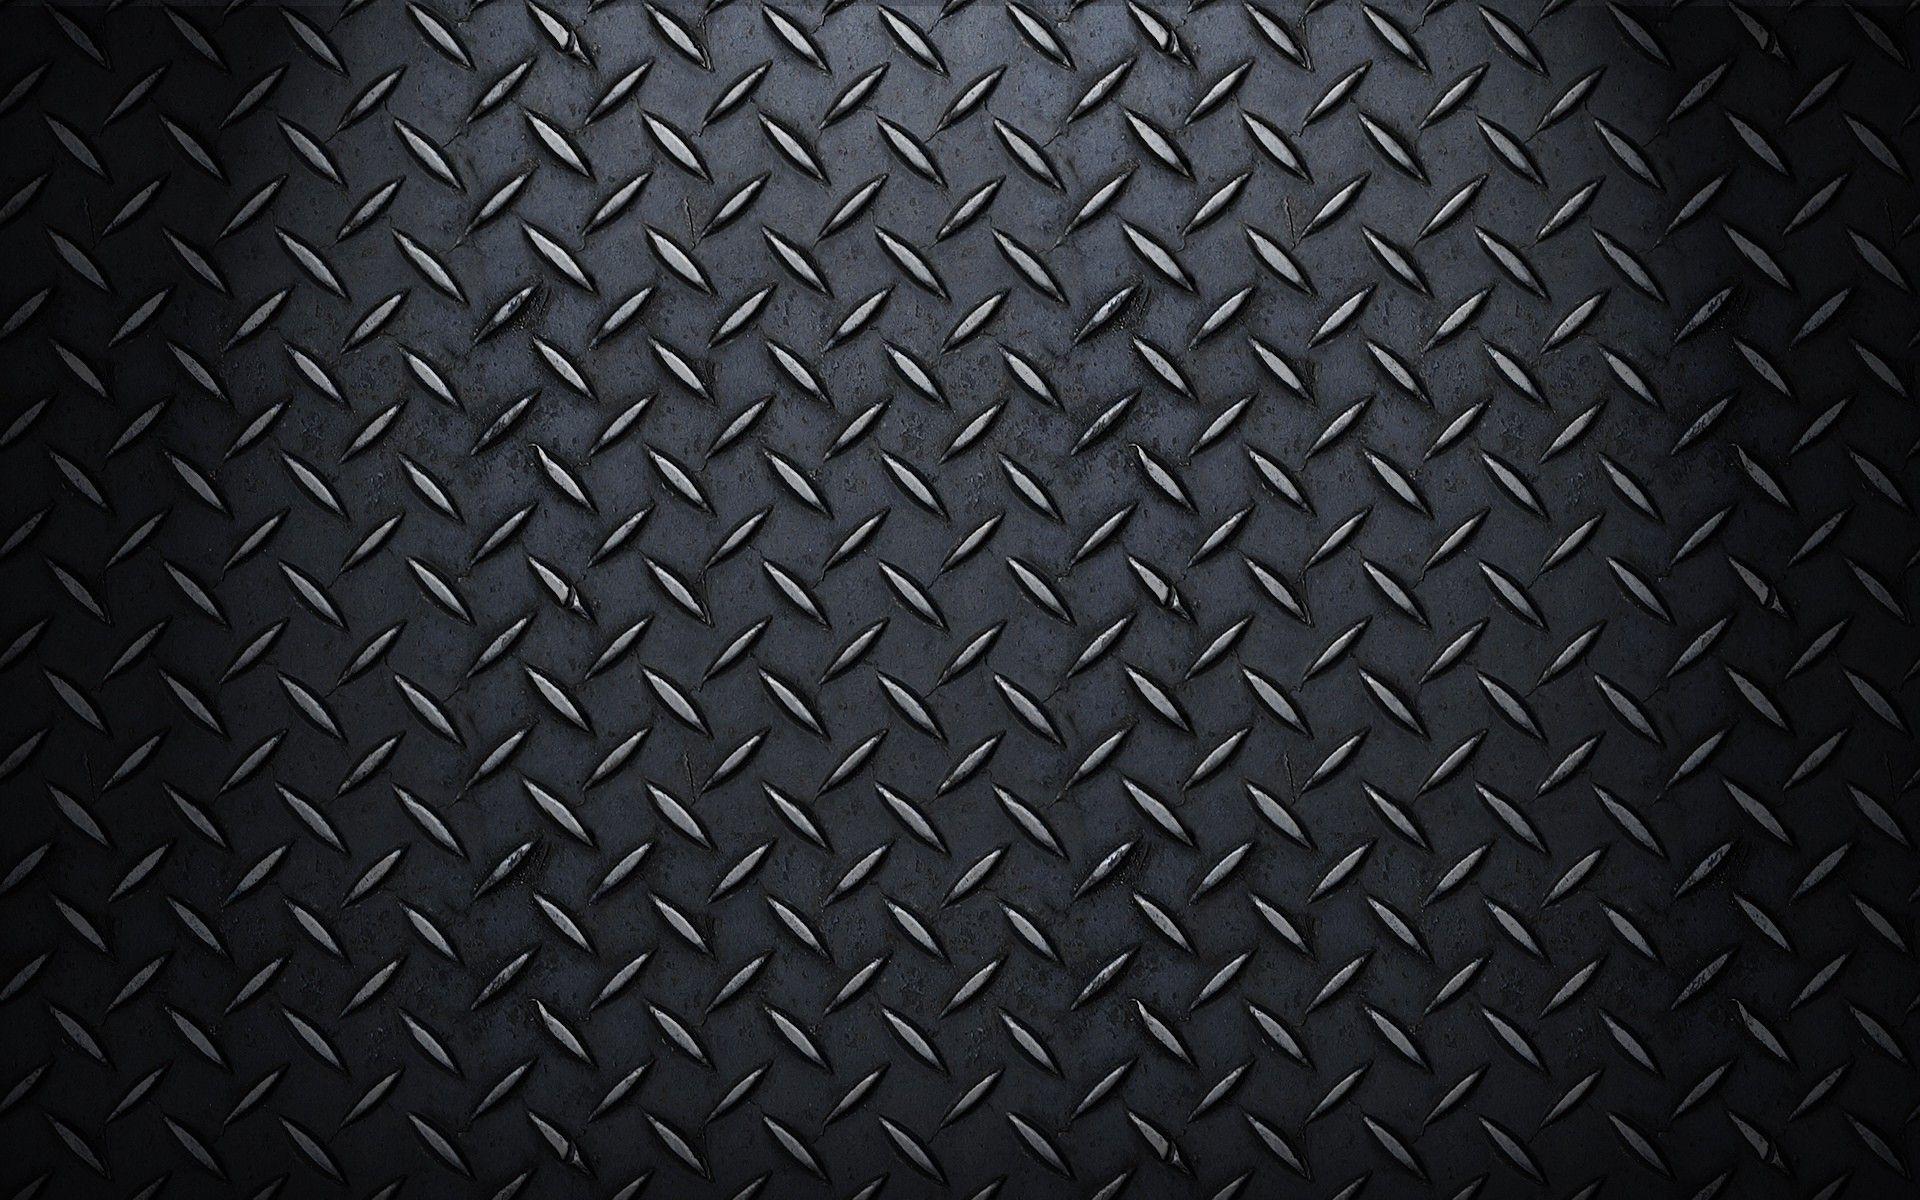 Carbon Fiber Pattern Wallpaper 1920x1200PX